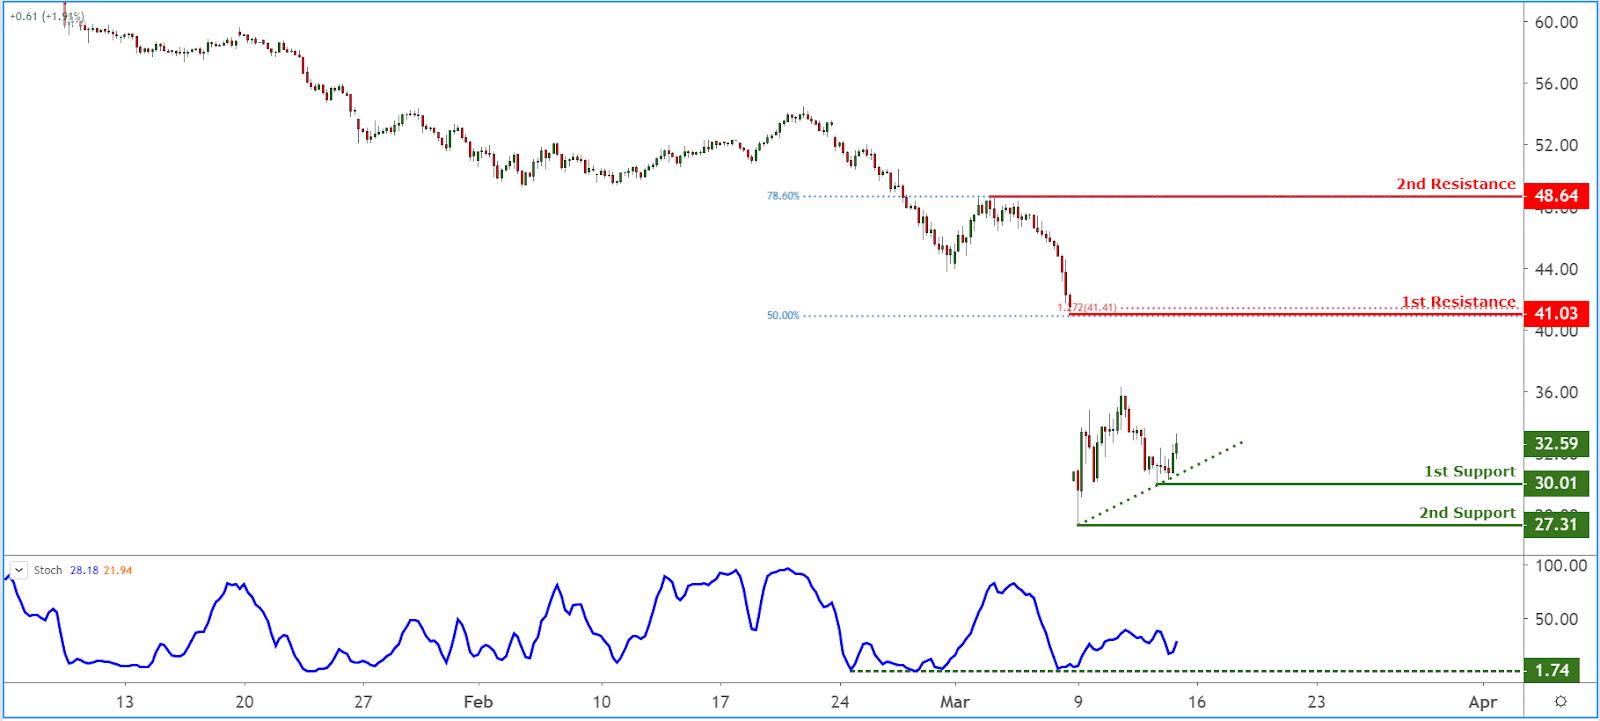 WTIUSD (USOIL) Chart, Source: TradingView.com